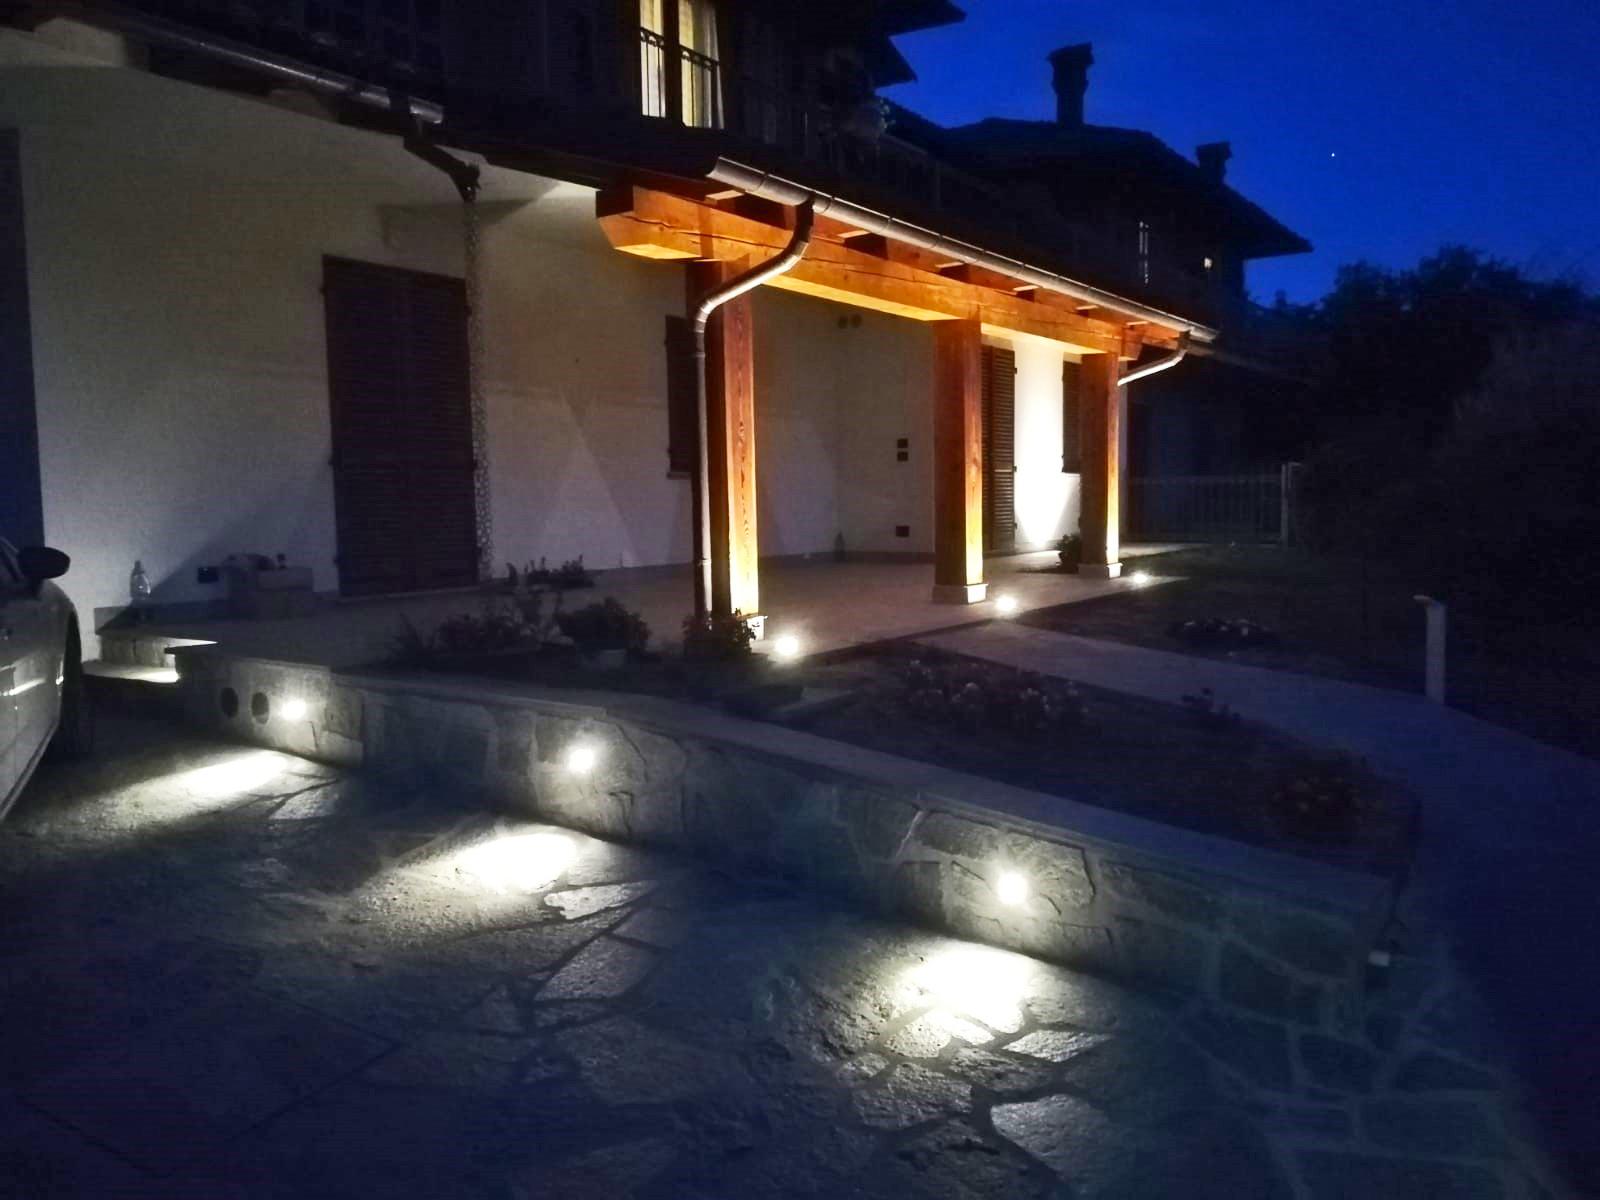 Sistemi di illuminazione » piemonte » cuneo » bra